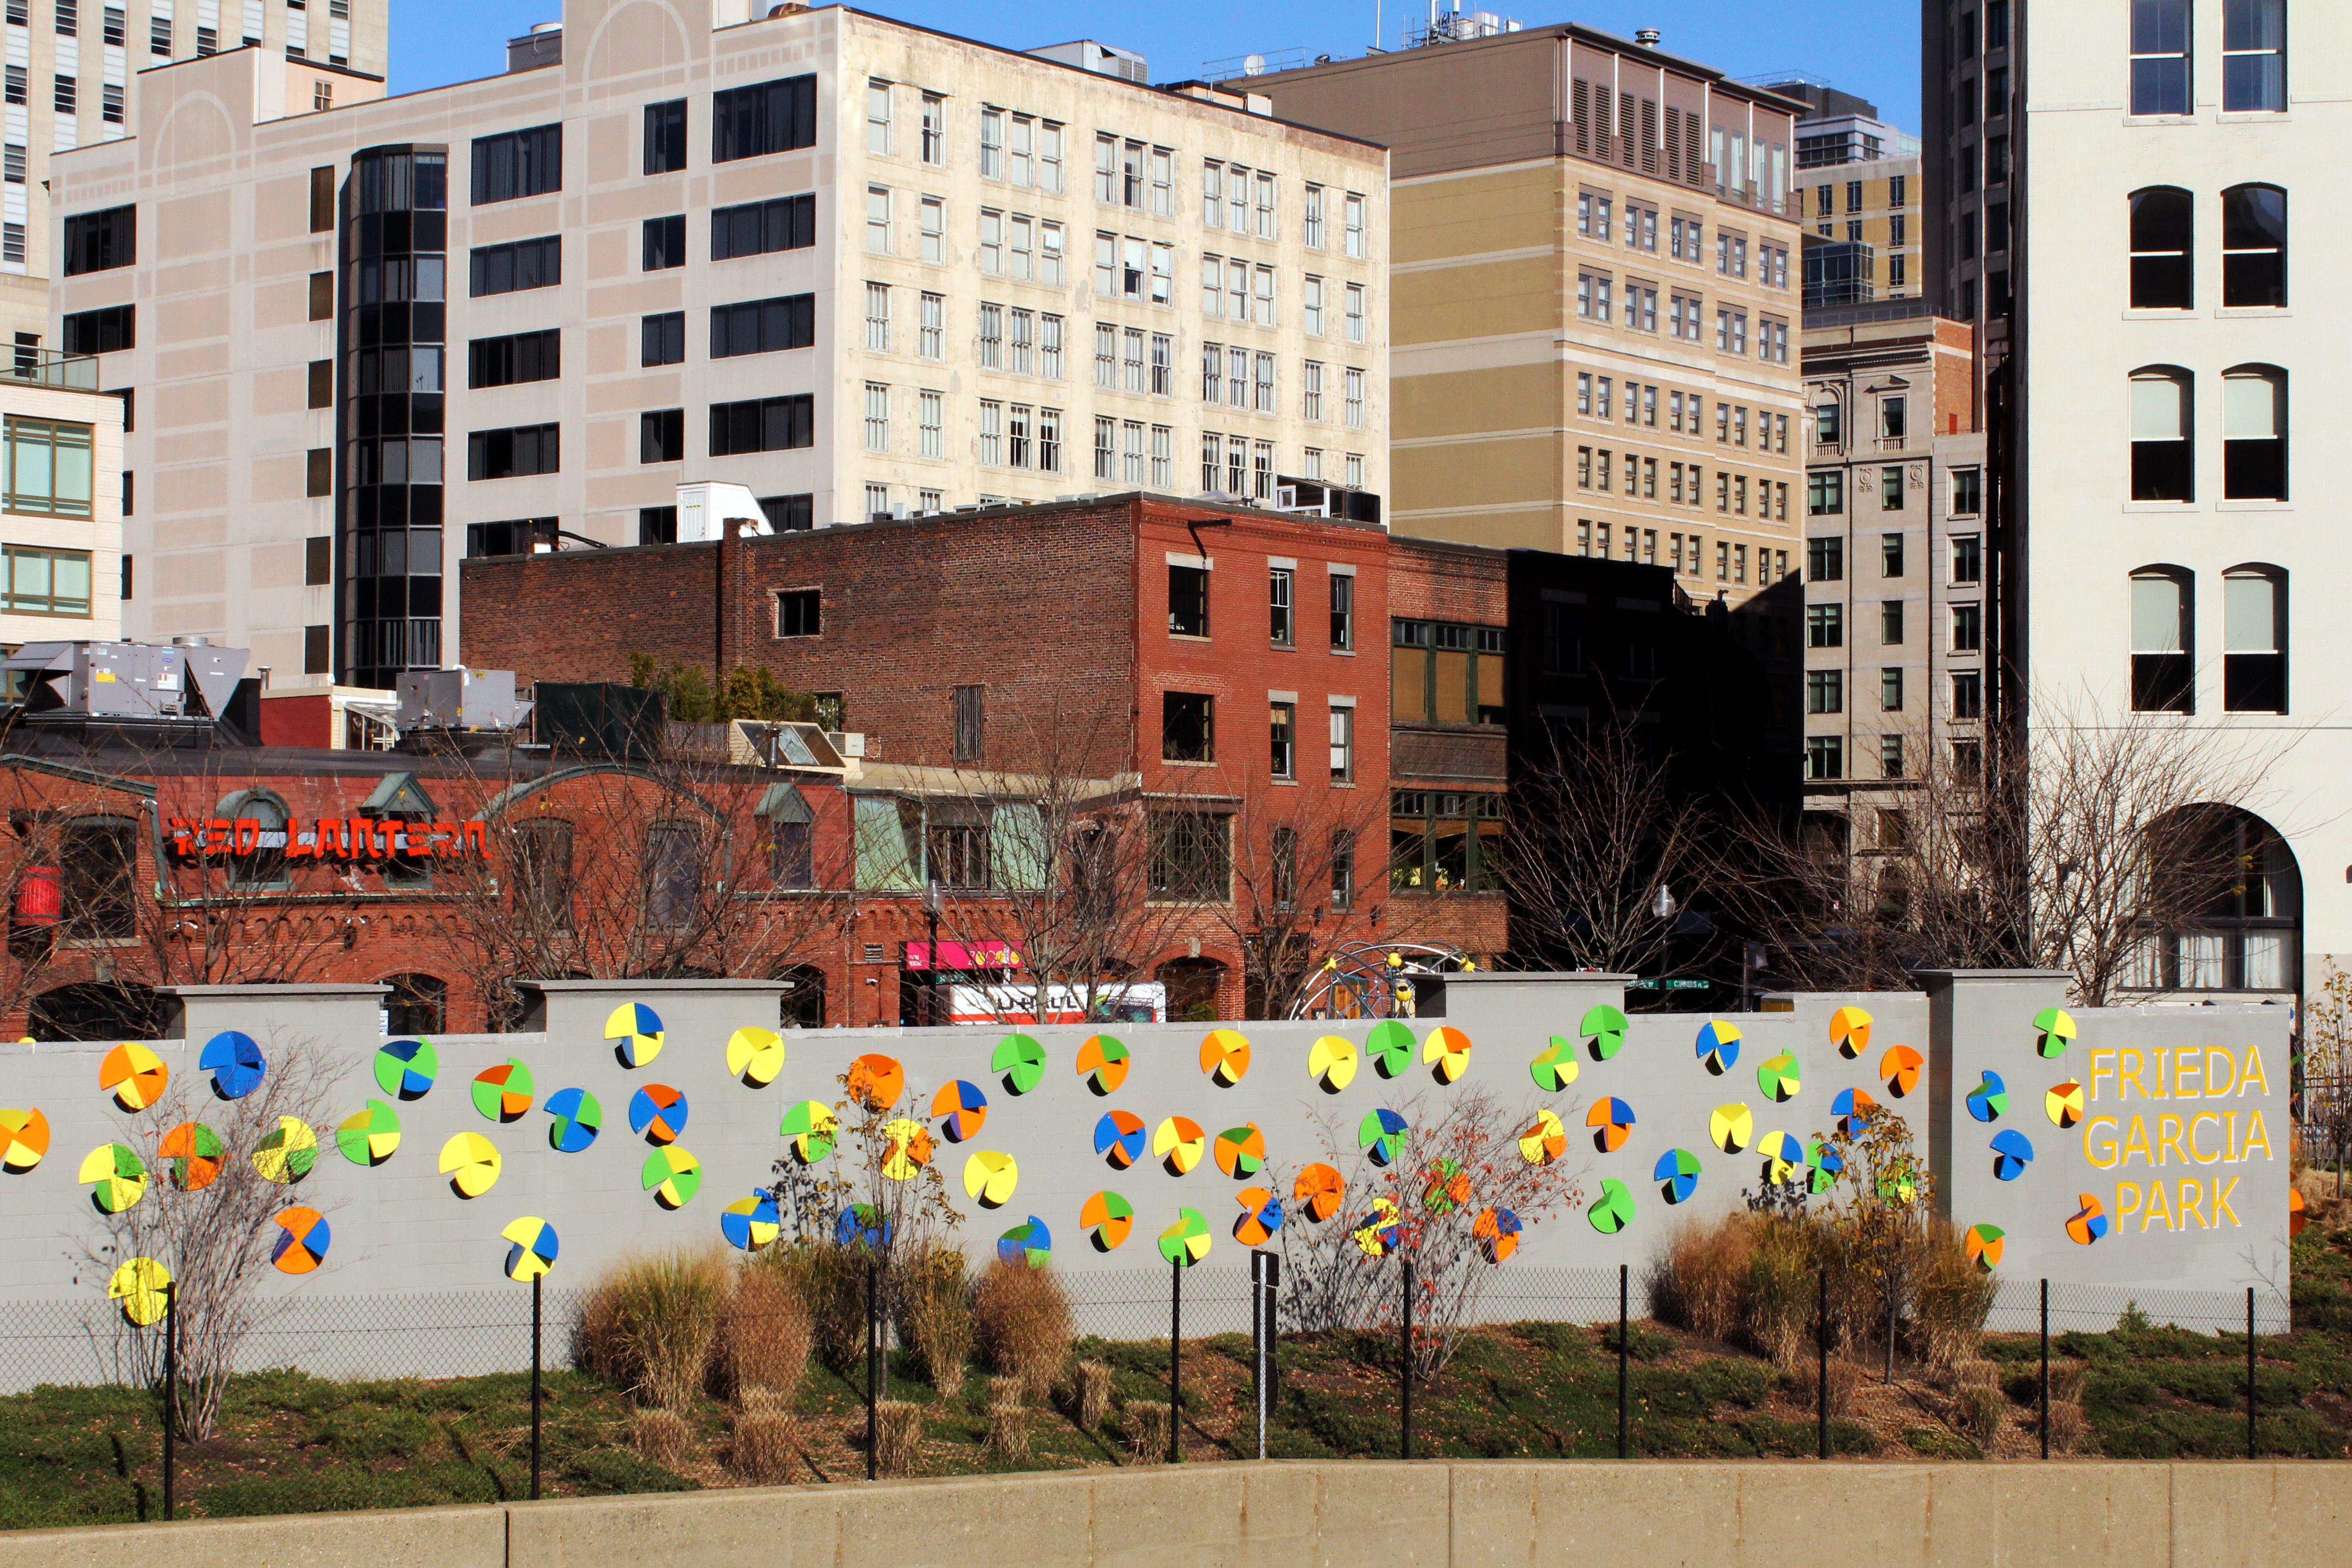 south end neighborhood public art